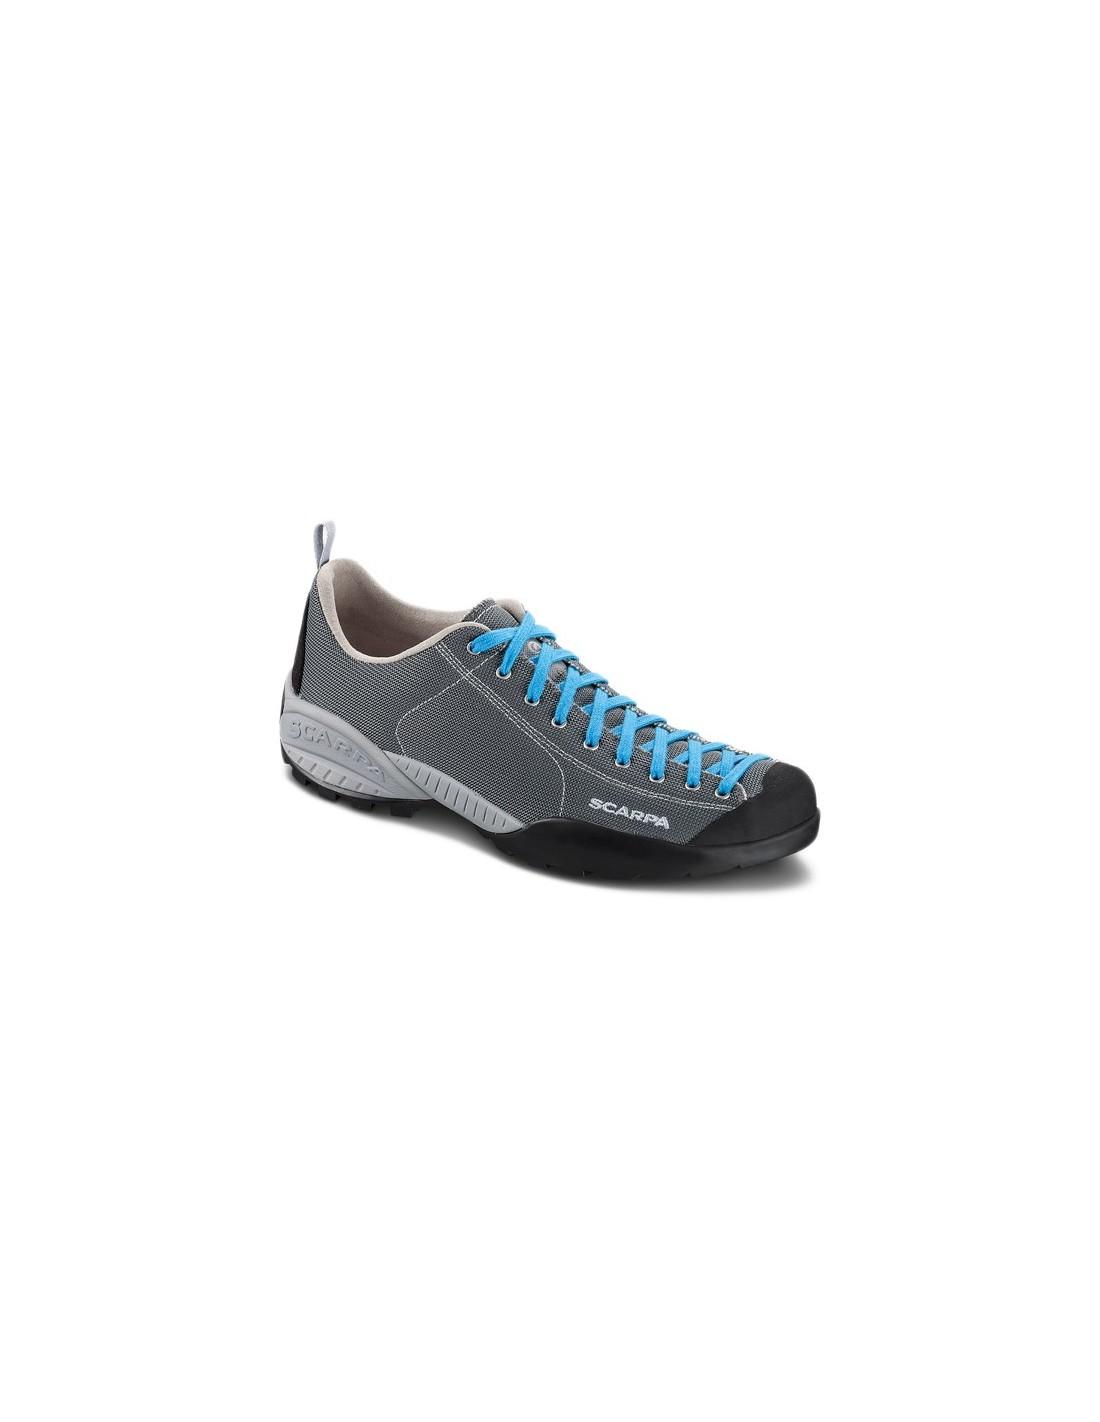 Scarpa MOJITO FRESH - Hiking shoes - gray/azure